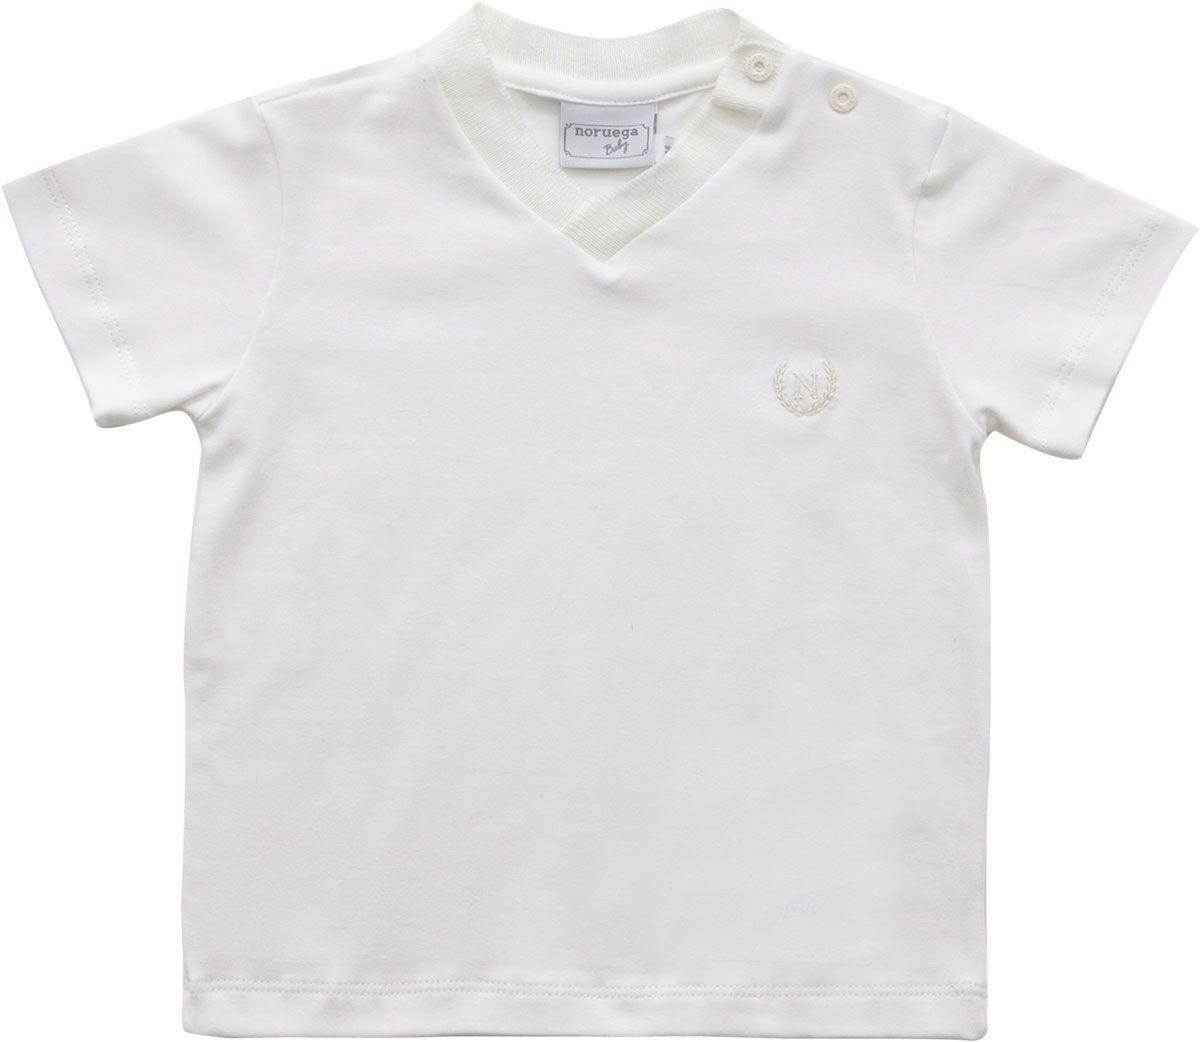 81.201 - Camisa Polo Gola V Bordado